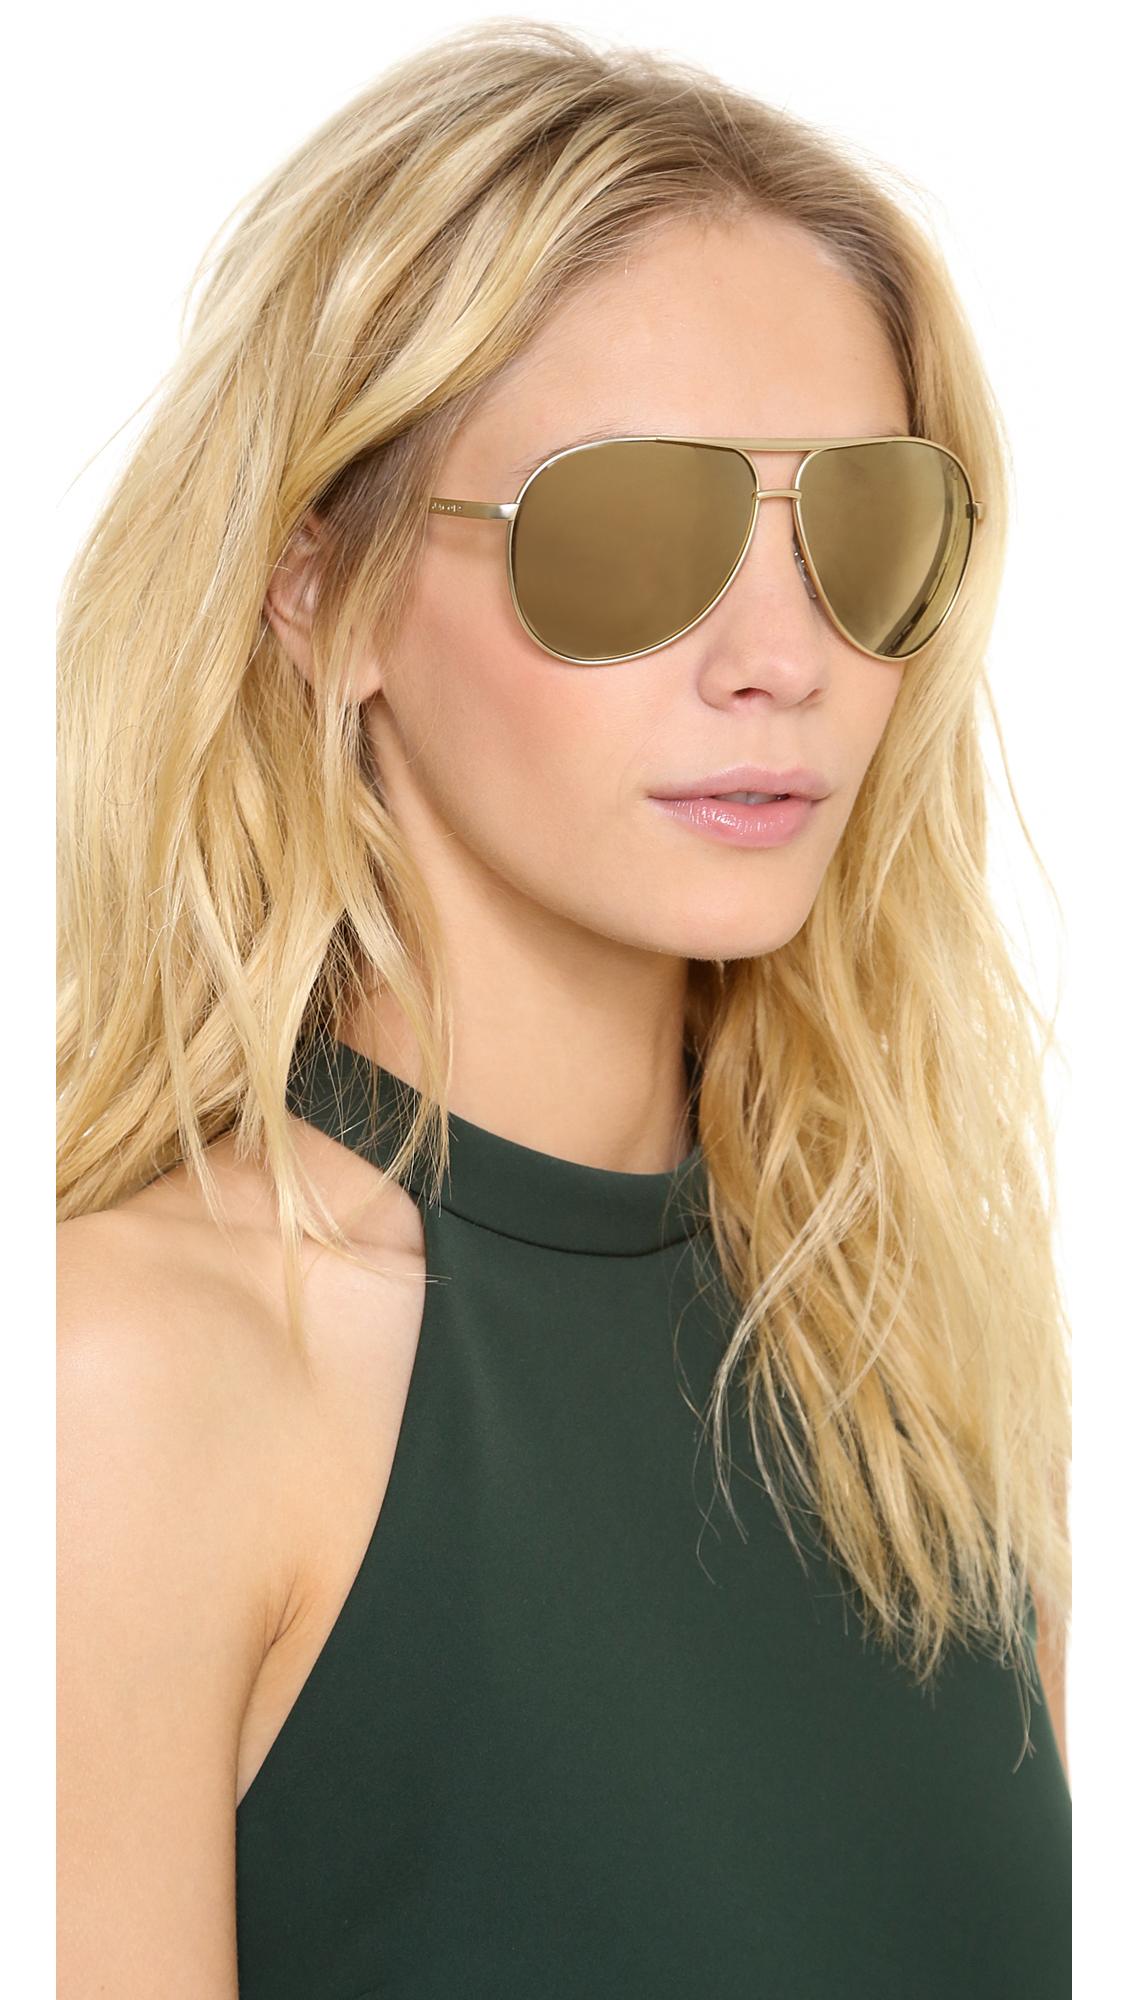 e044915da07cd Marc Jacobs Sunglasses Mirrored Aviator Sunglasses